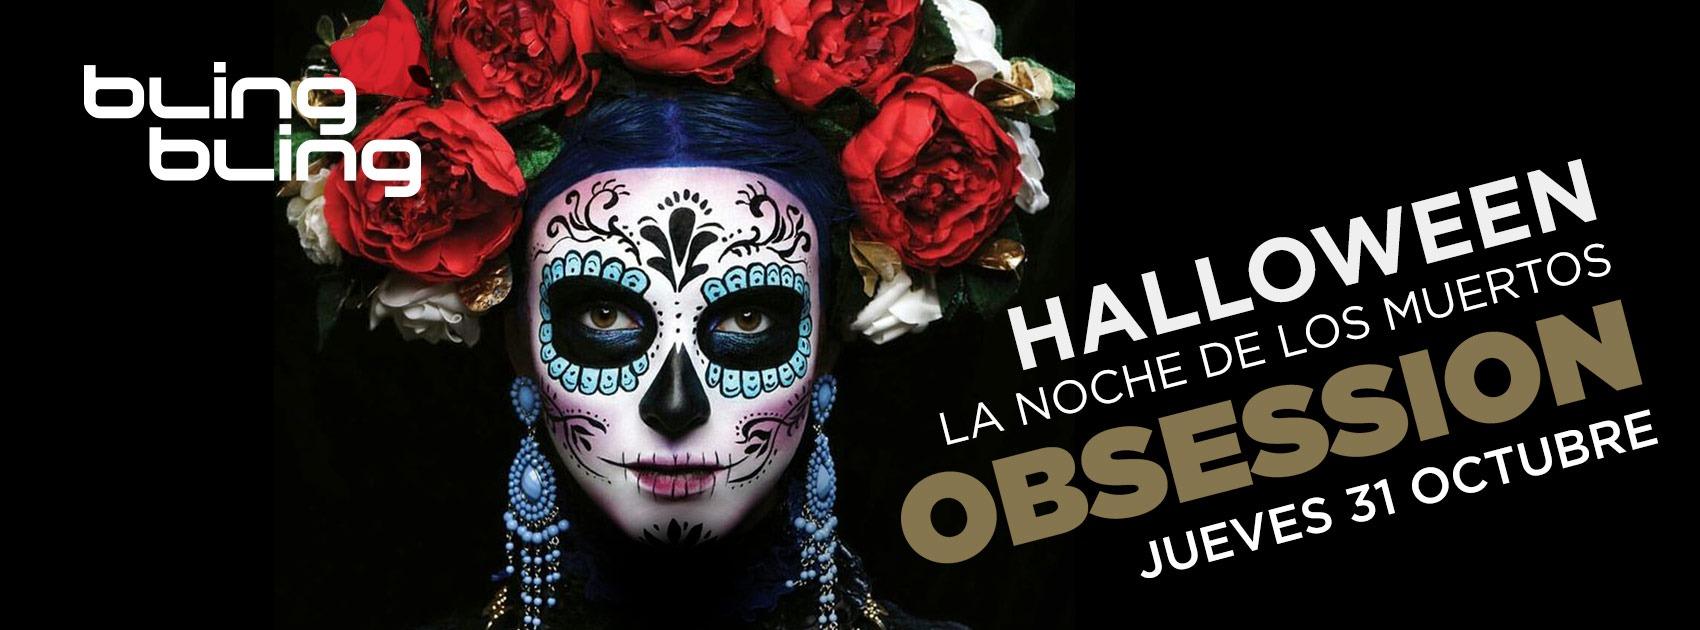 OBSESSION - LA NOCHE DE LOS MUERTOS - Club Bling Bling